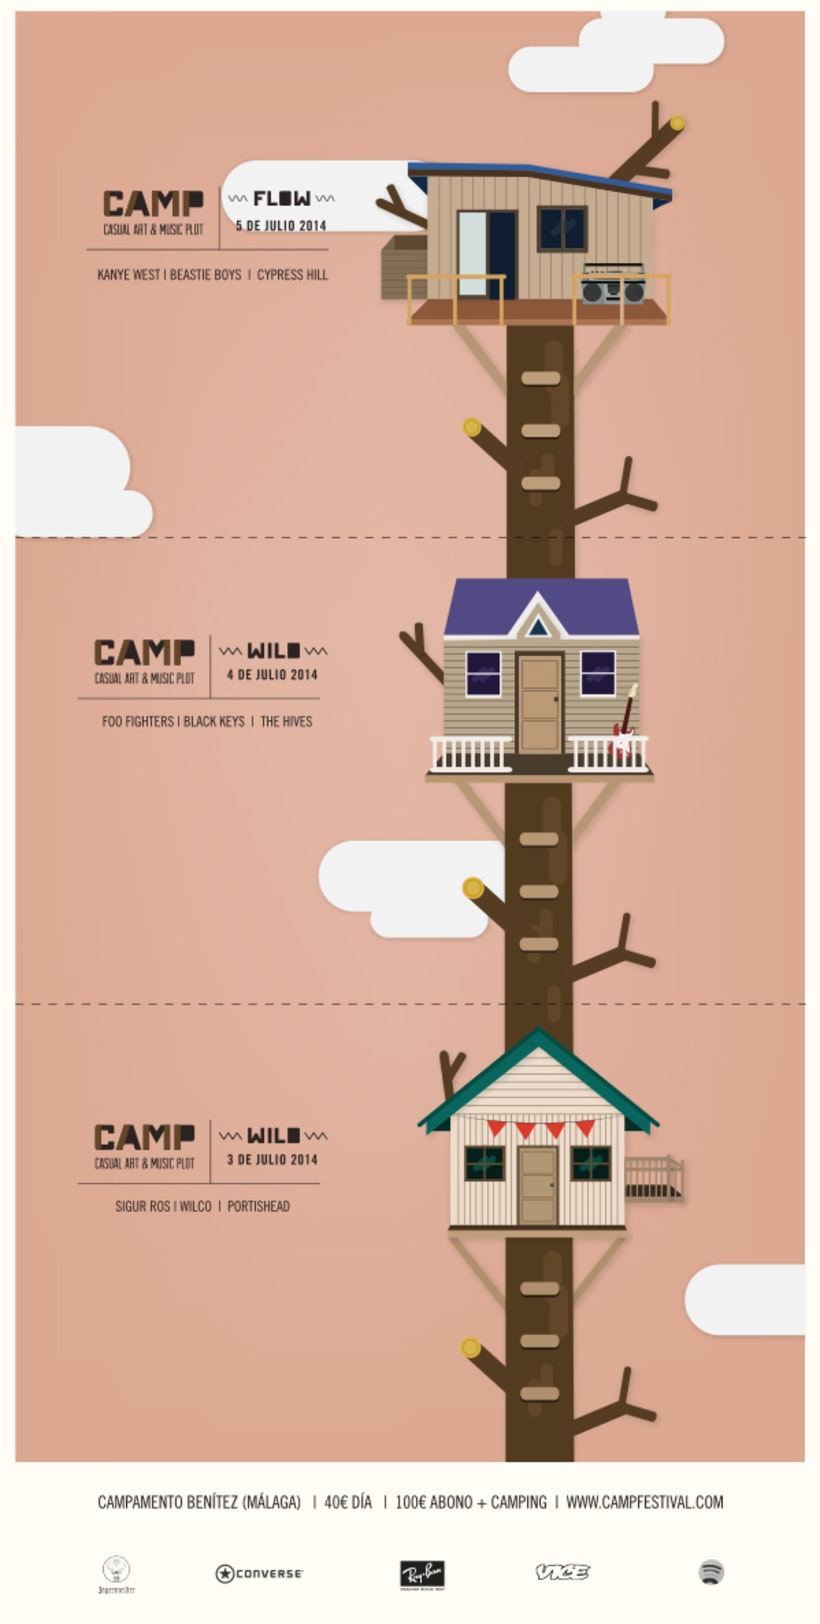 CAMP Festival 7